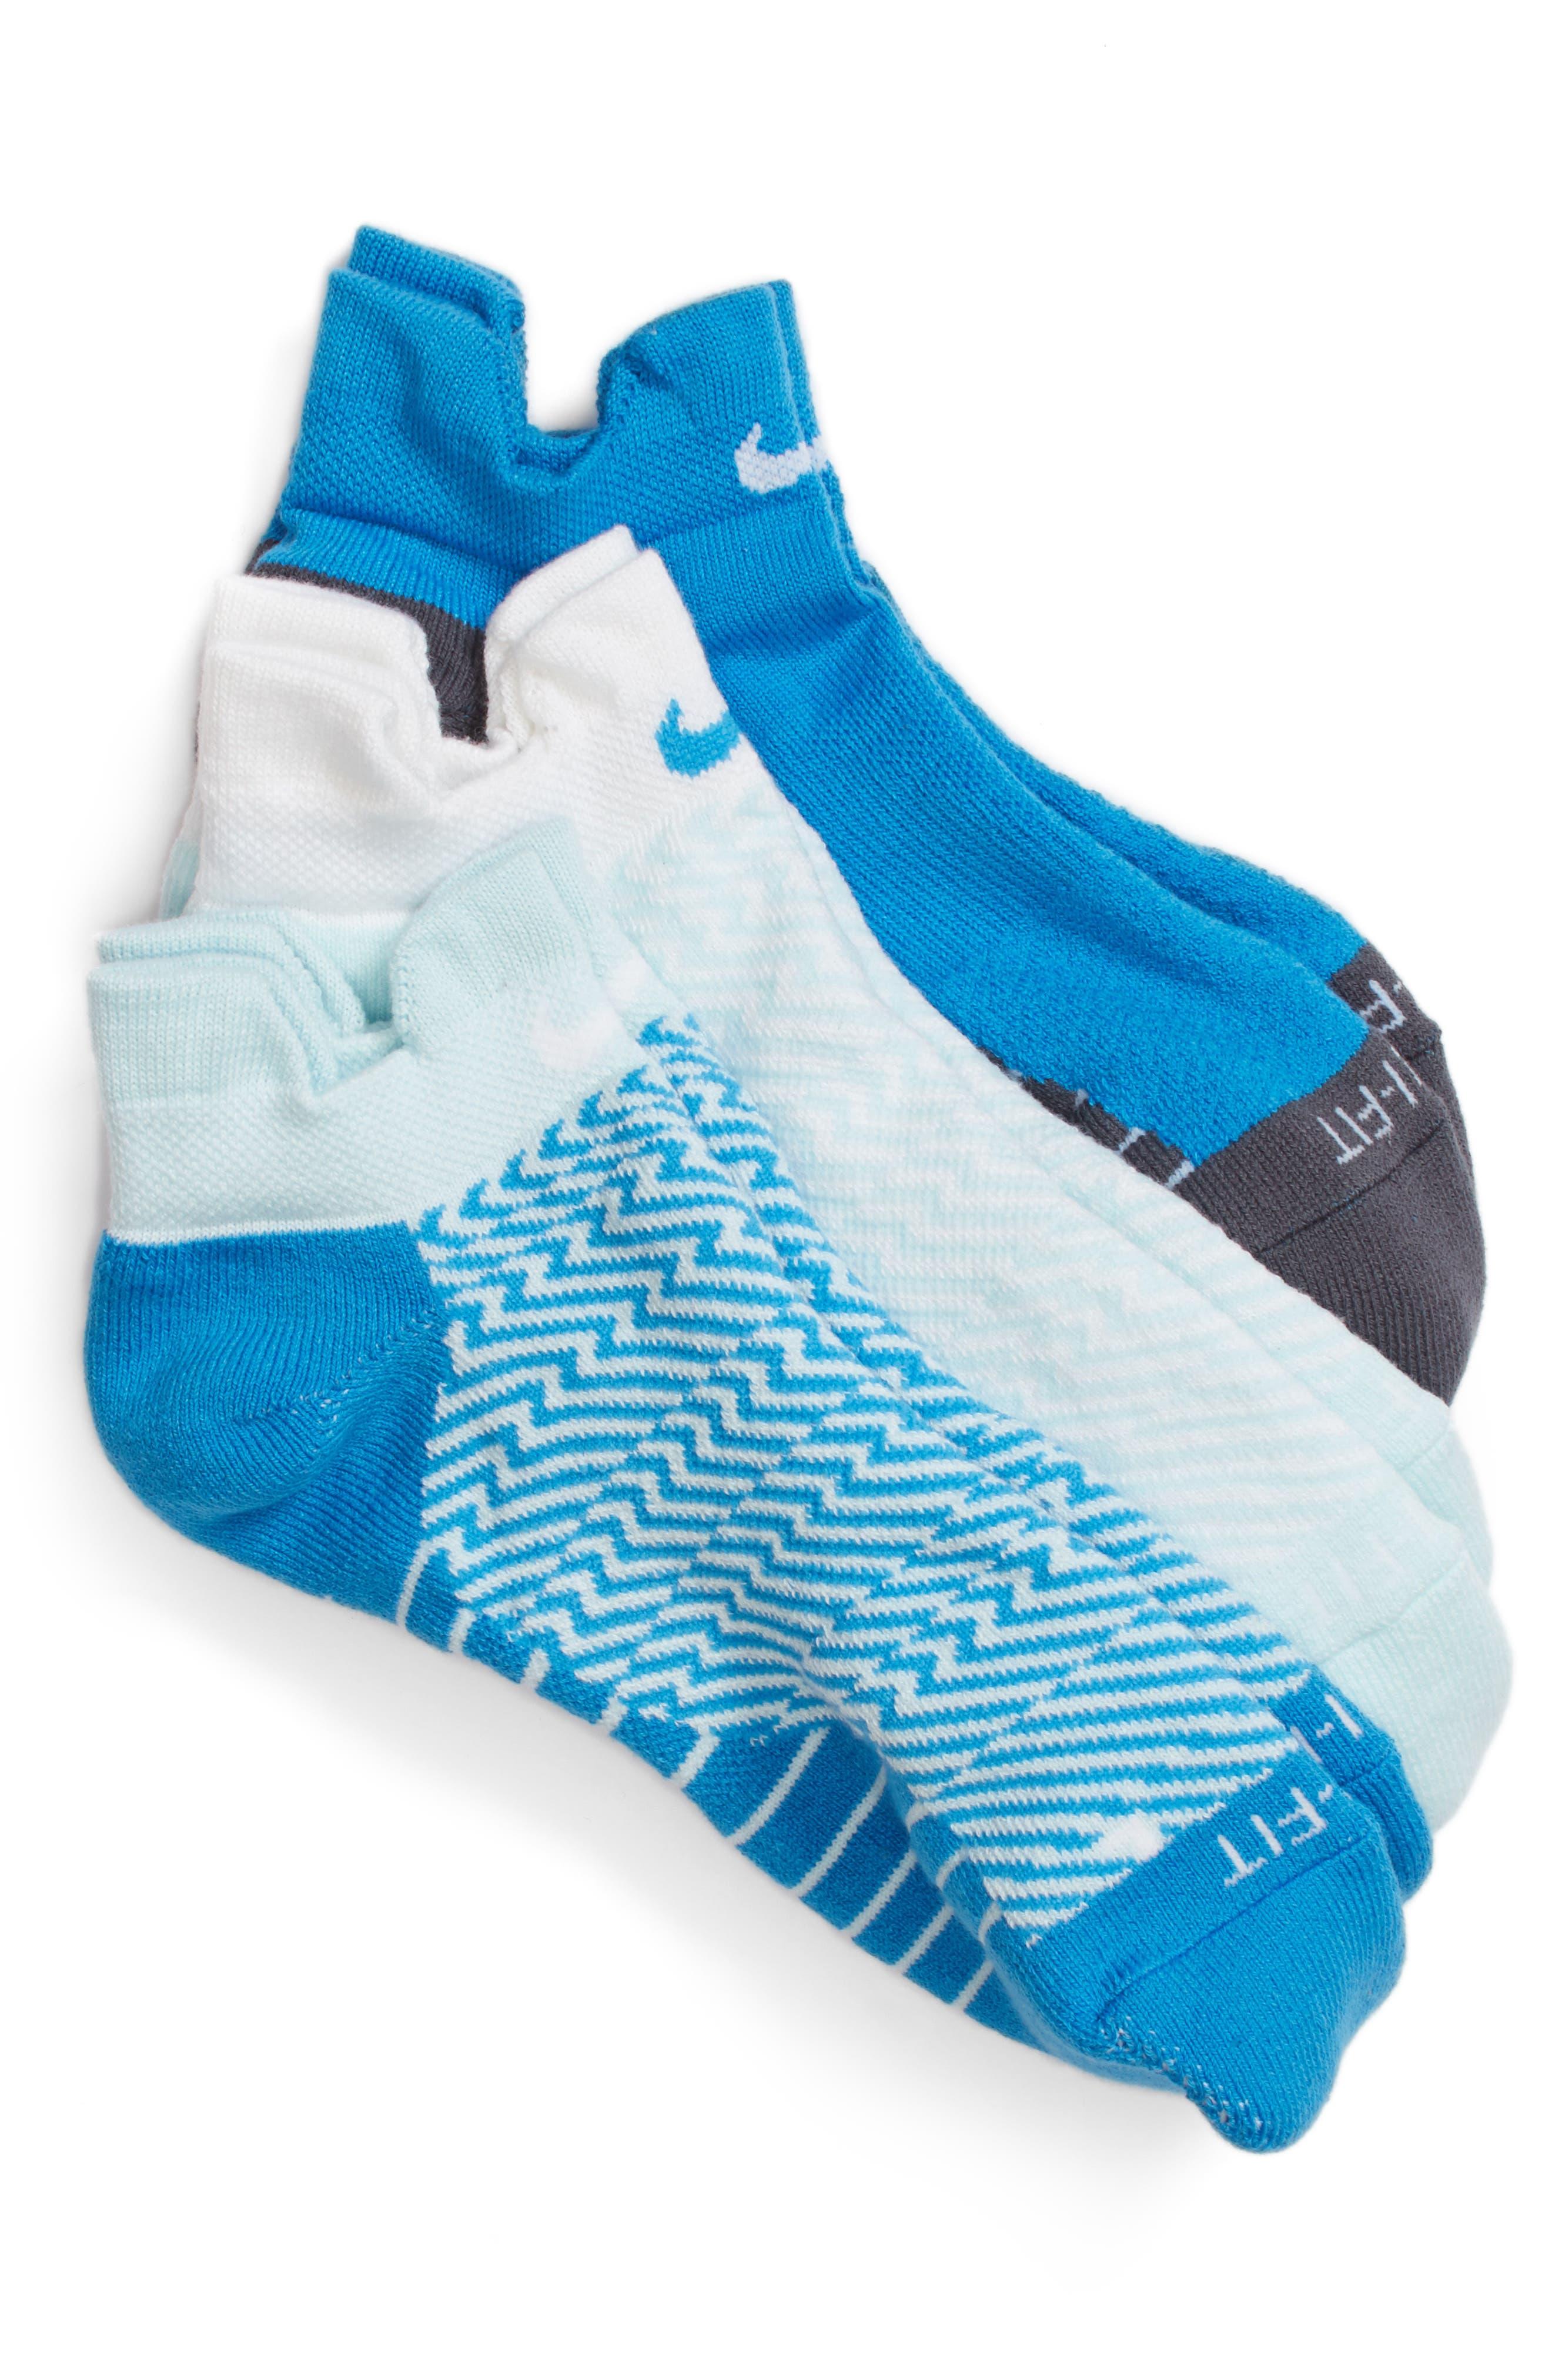 Nike Elite 3-Pack Reflective Running Tab Socks